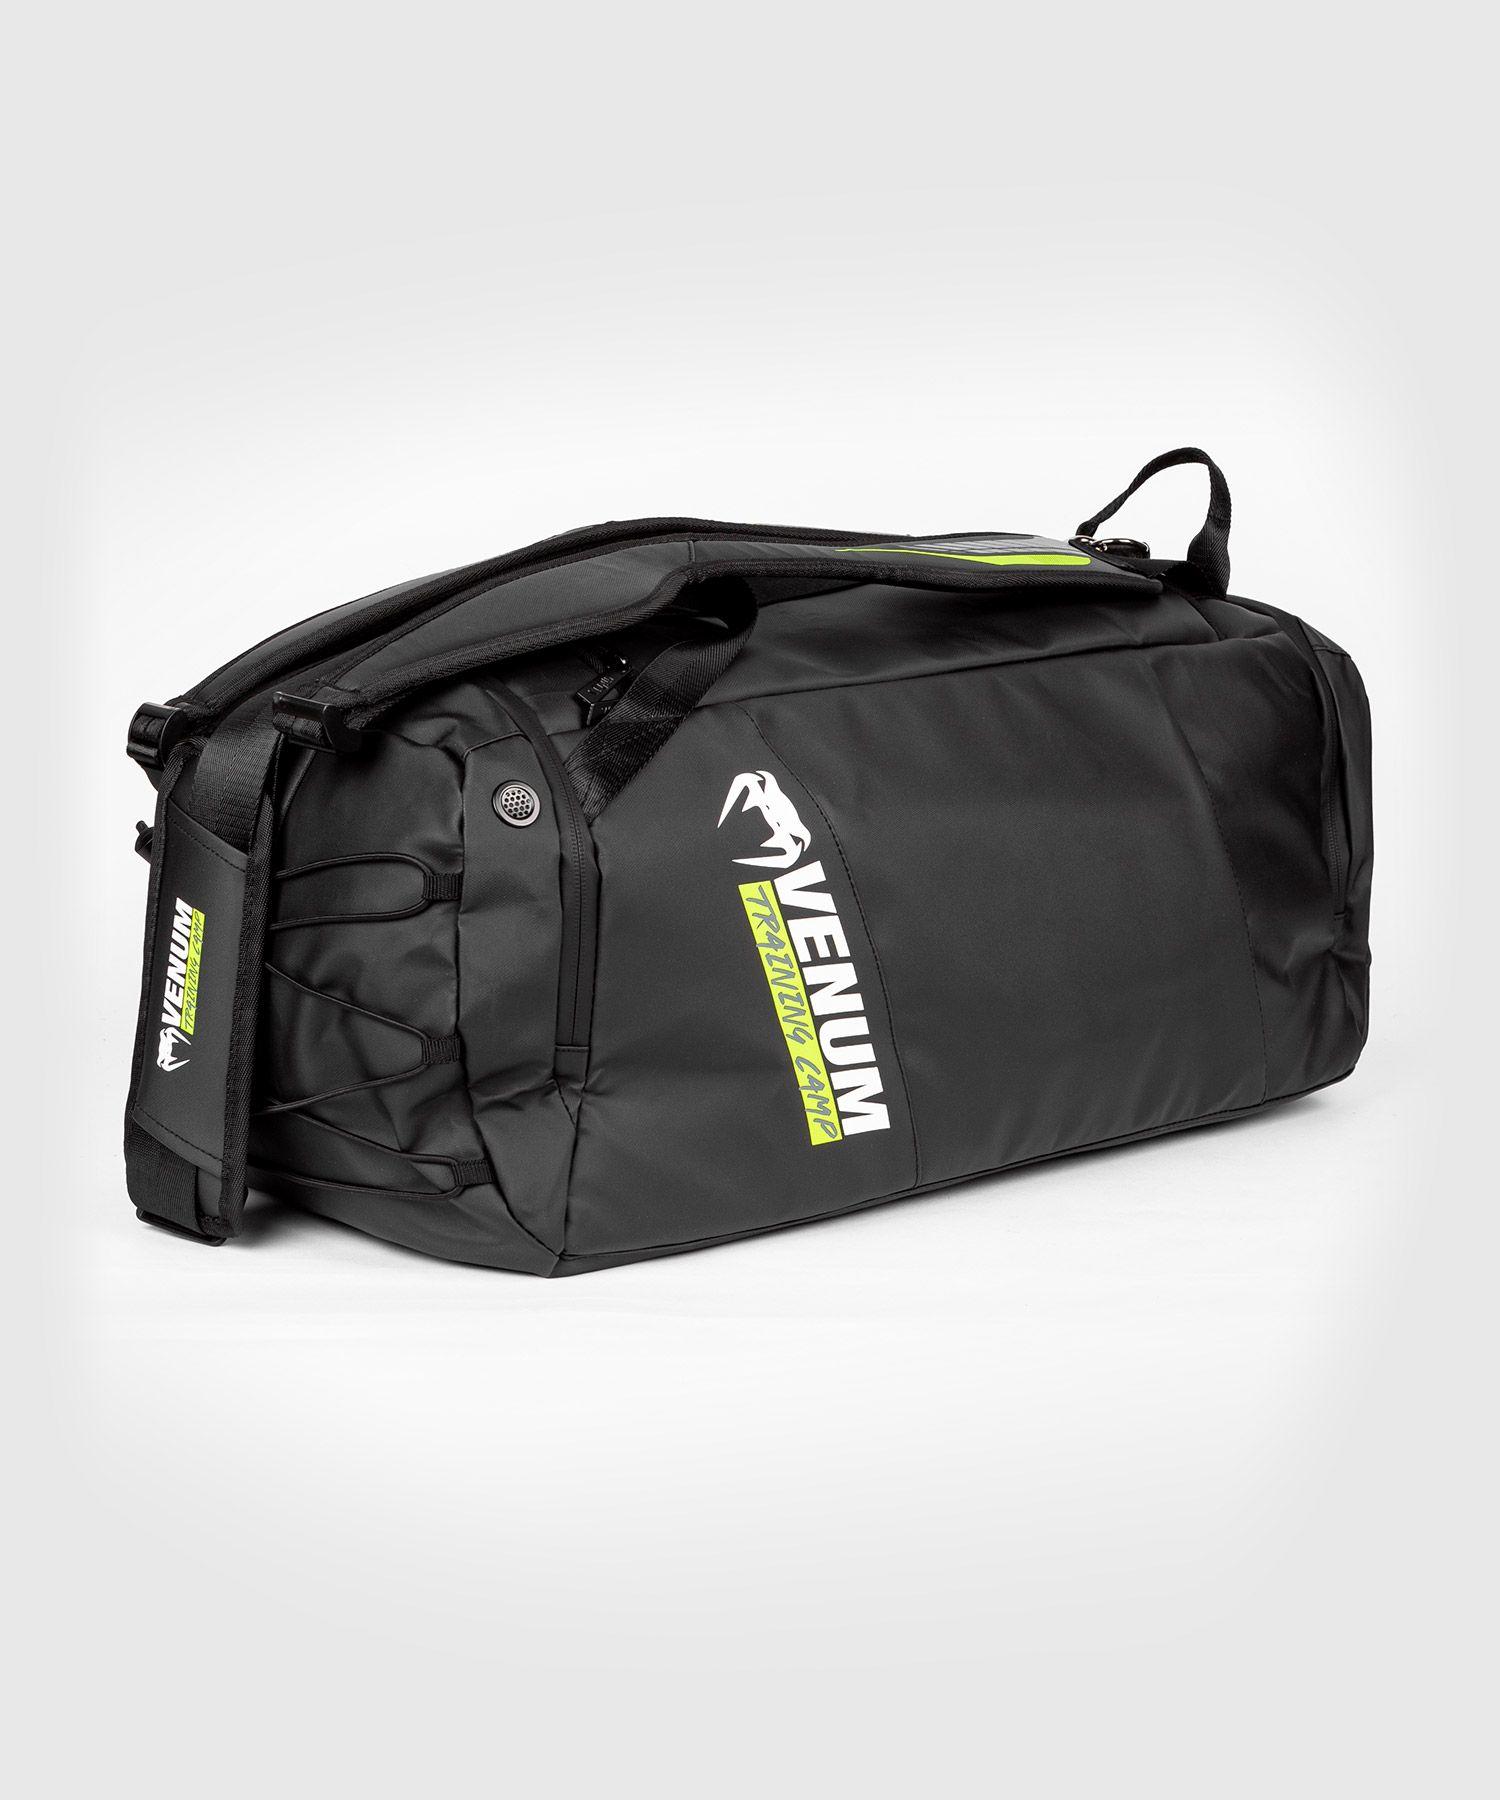 Спортивная сумка VTC 3.0 Hybrid 2-в-1